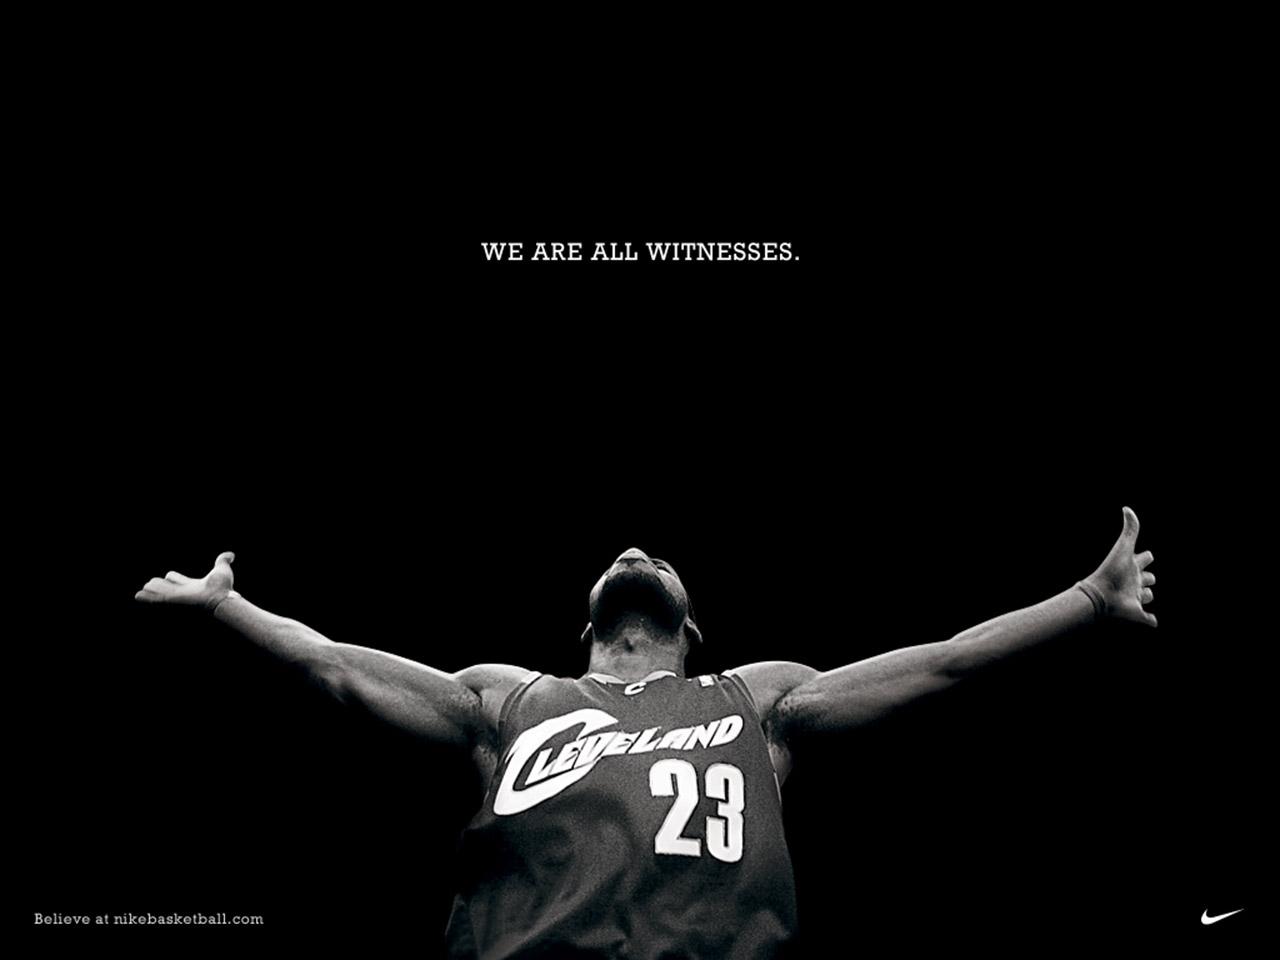 Fondo de pantalla de LeBron James y Nike 1280x960